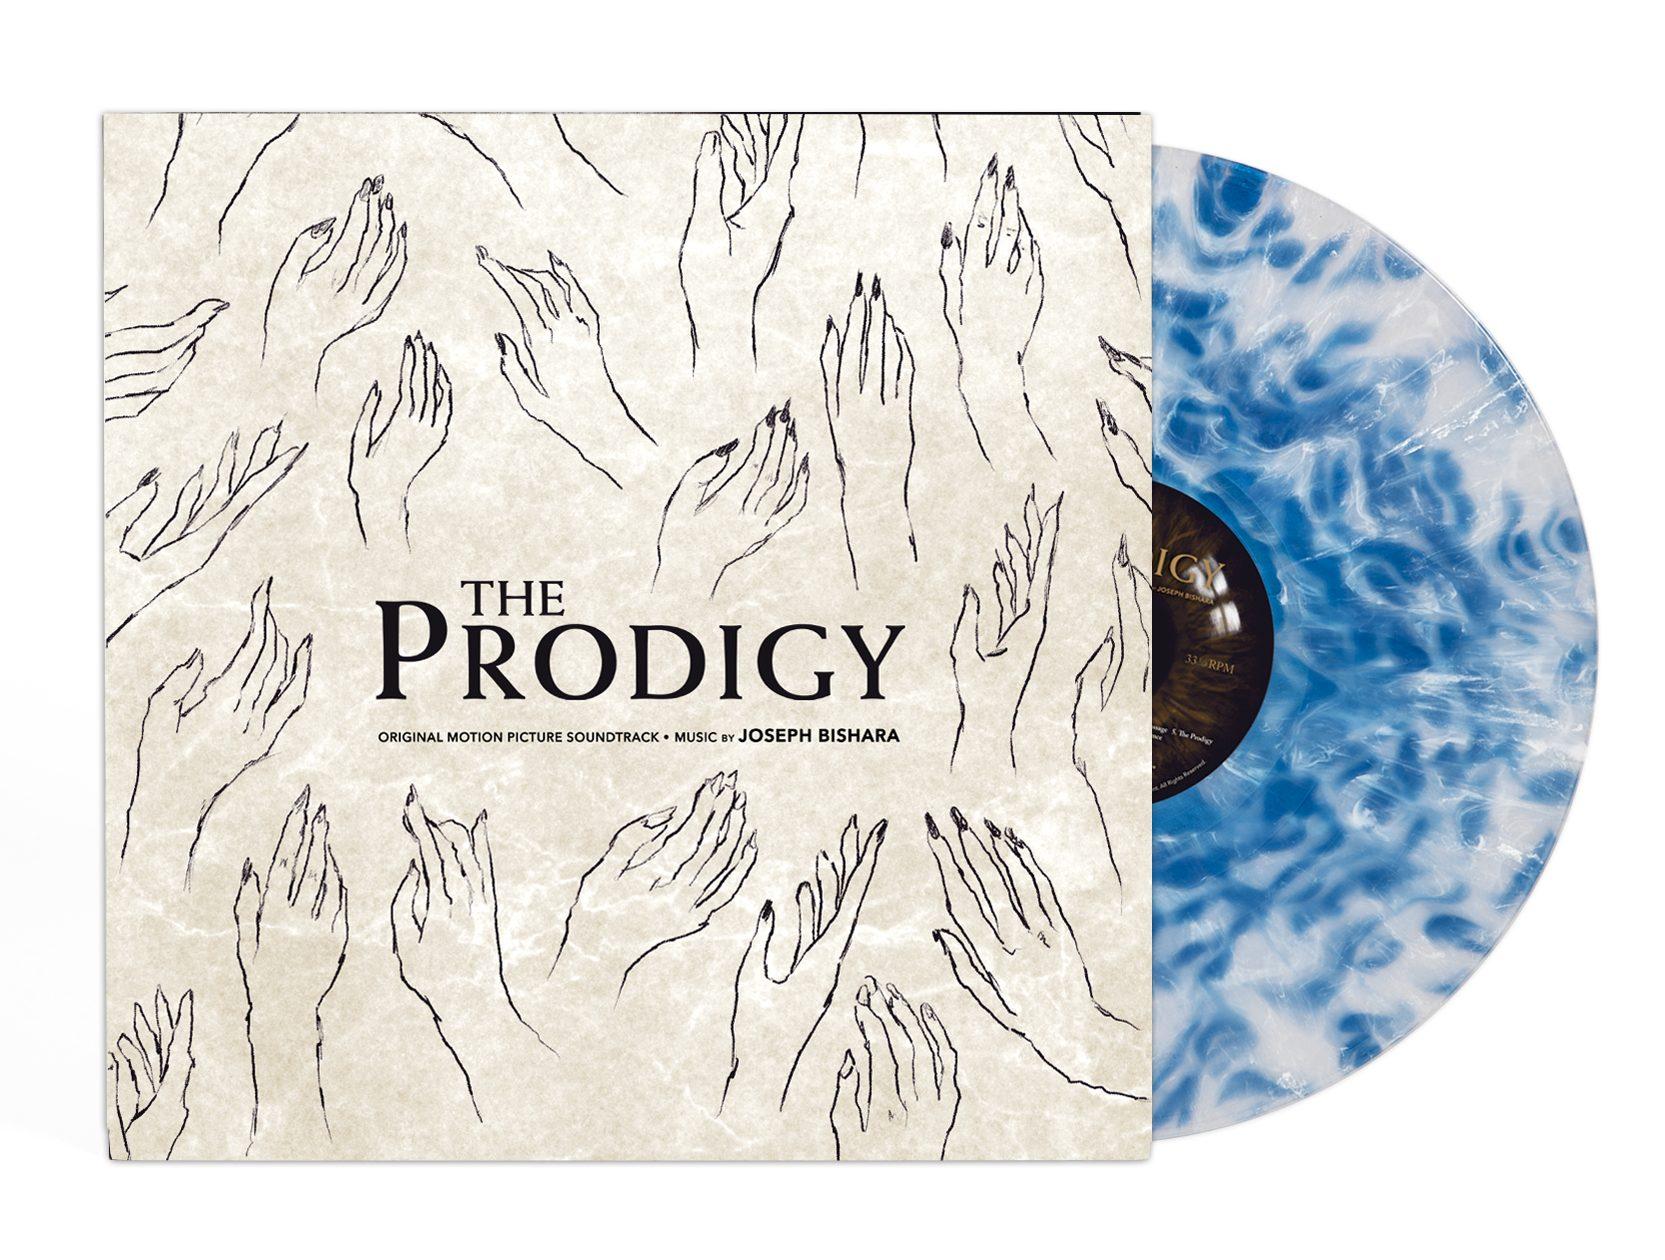 The Prodigy (Waxwork Records)